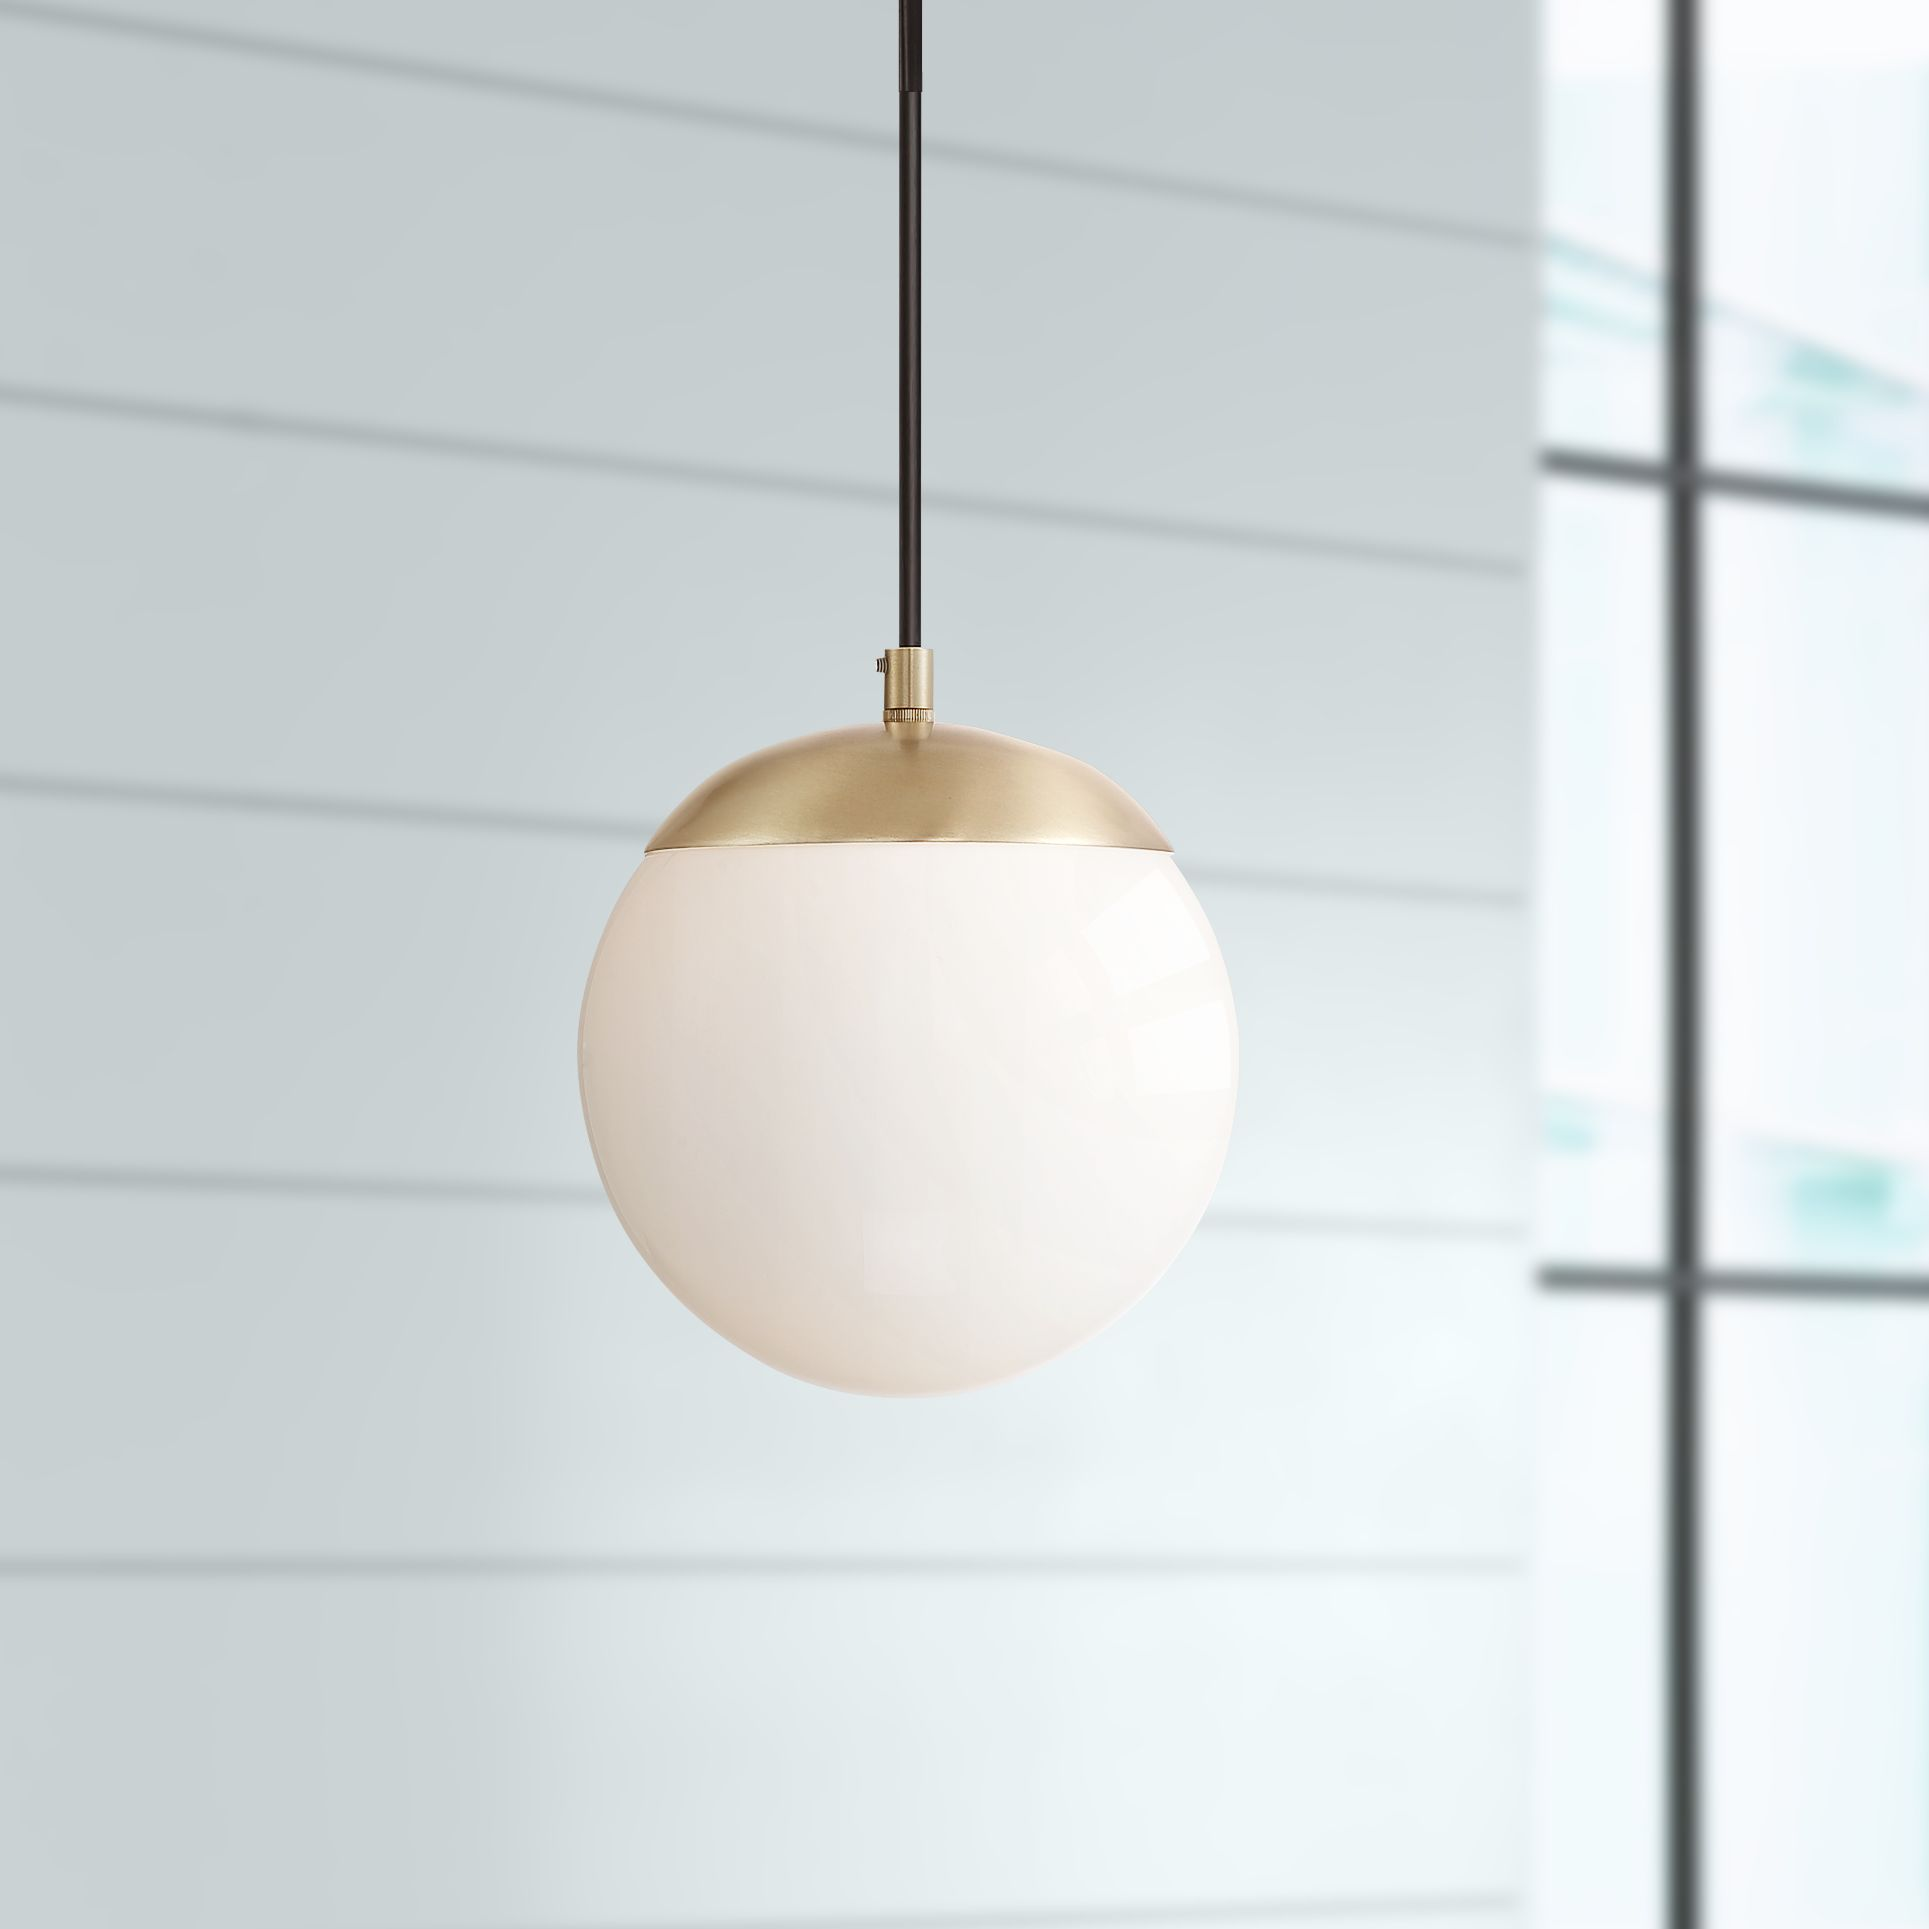 Image of: Possini Euro Design Warm Brass Mini Pendant Light 8 Wide Mid Century Modern Led Opal Glass For Kitchen Island Dining Room Walmart Com Walmart Com